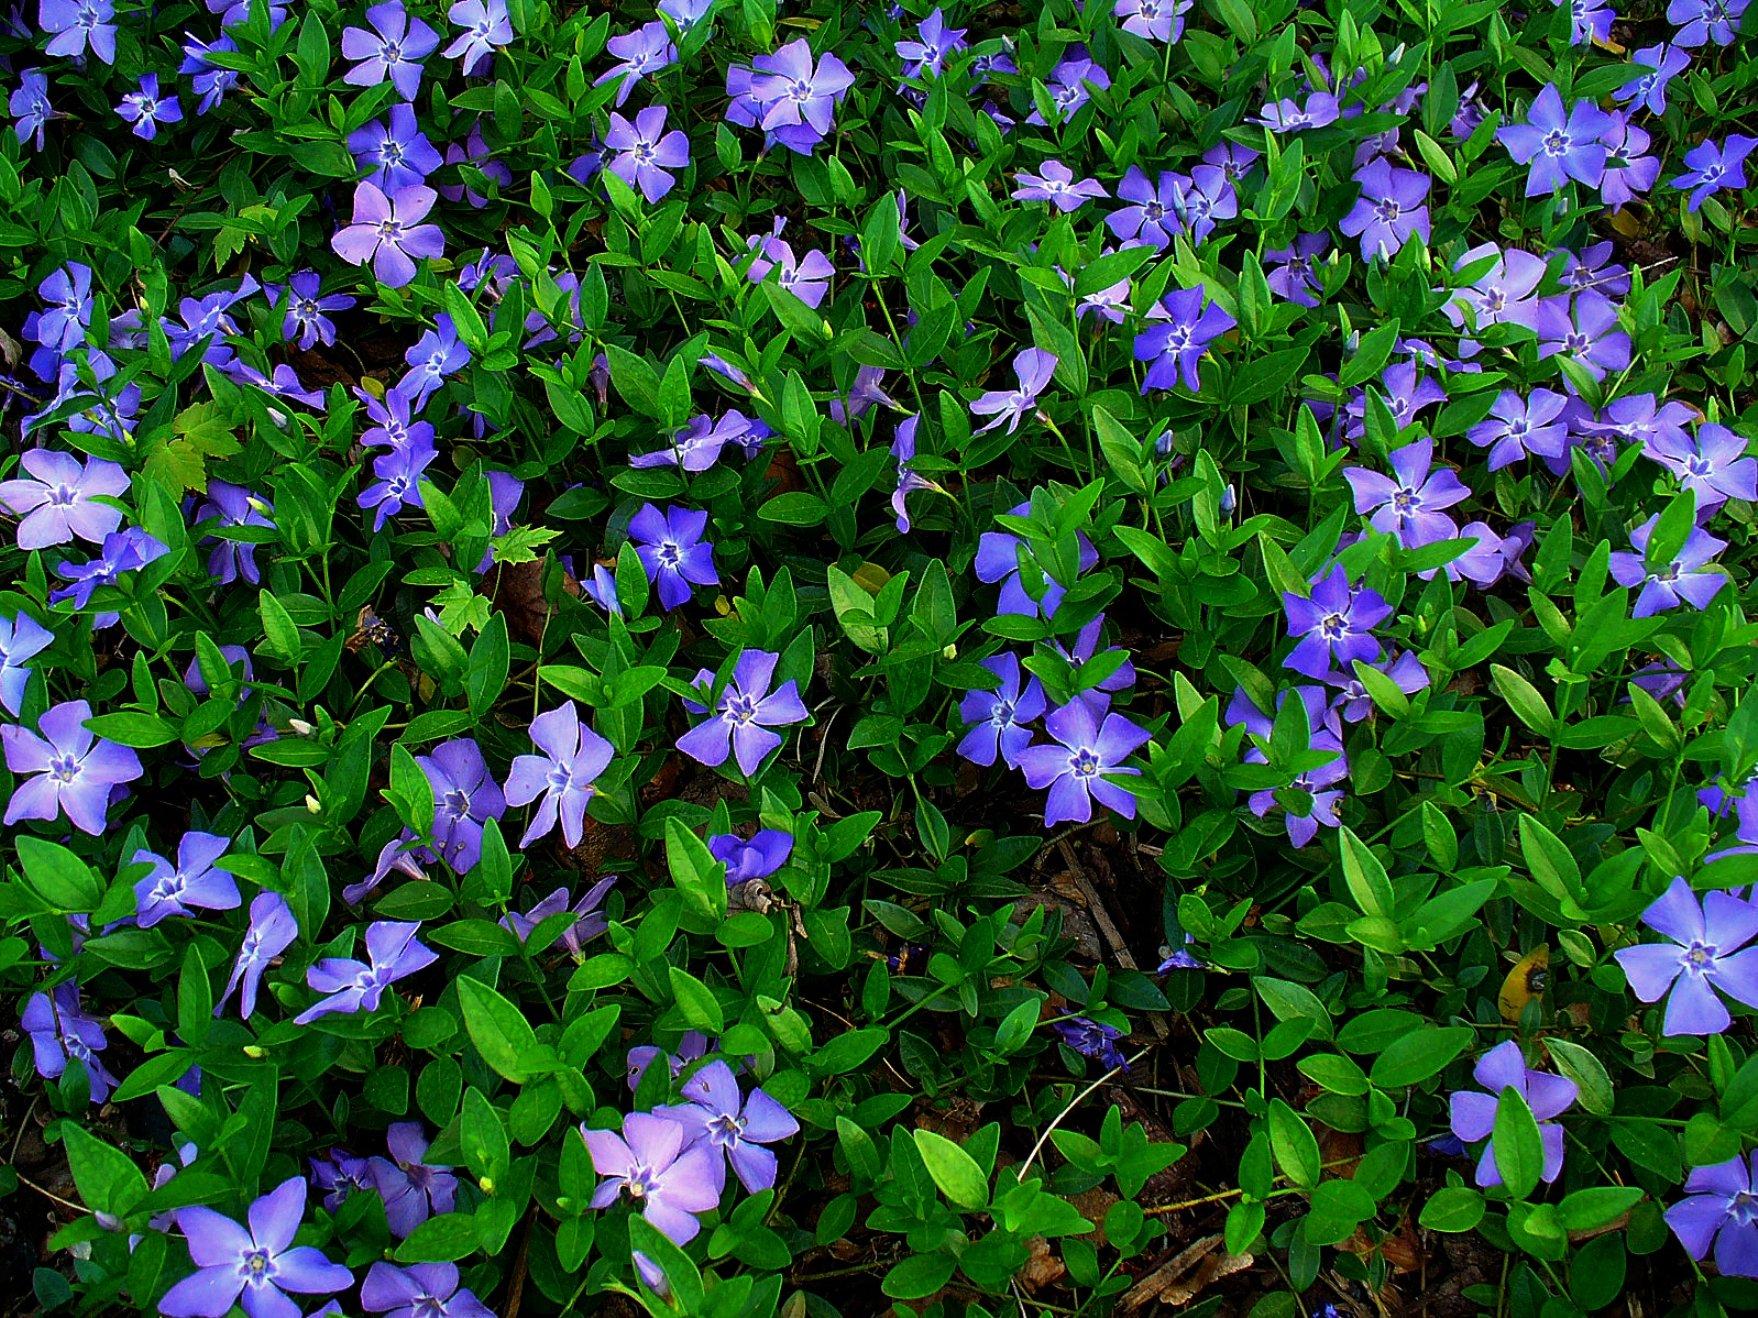 Evergreen 100 Plants Creeping Myrtle Vinca Minor Plants Ground Cover, Zone 4-9 by socaldavid24 (Image #1)